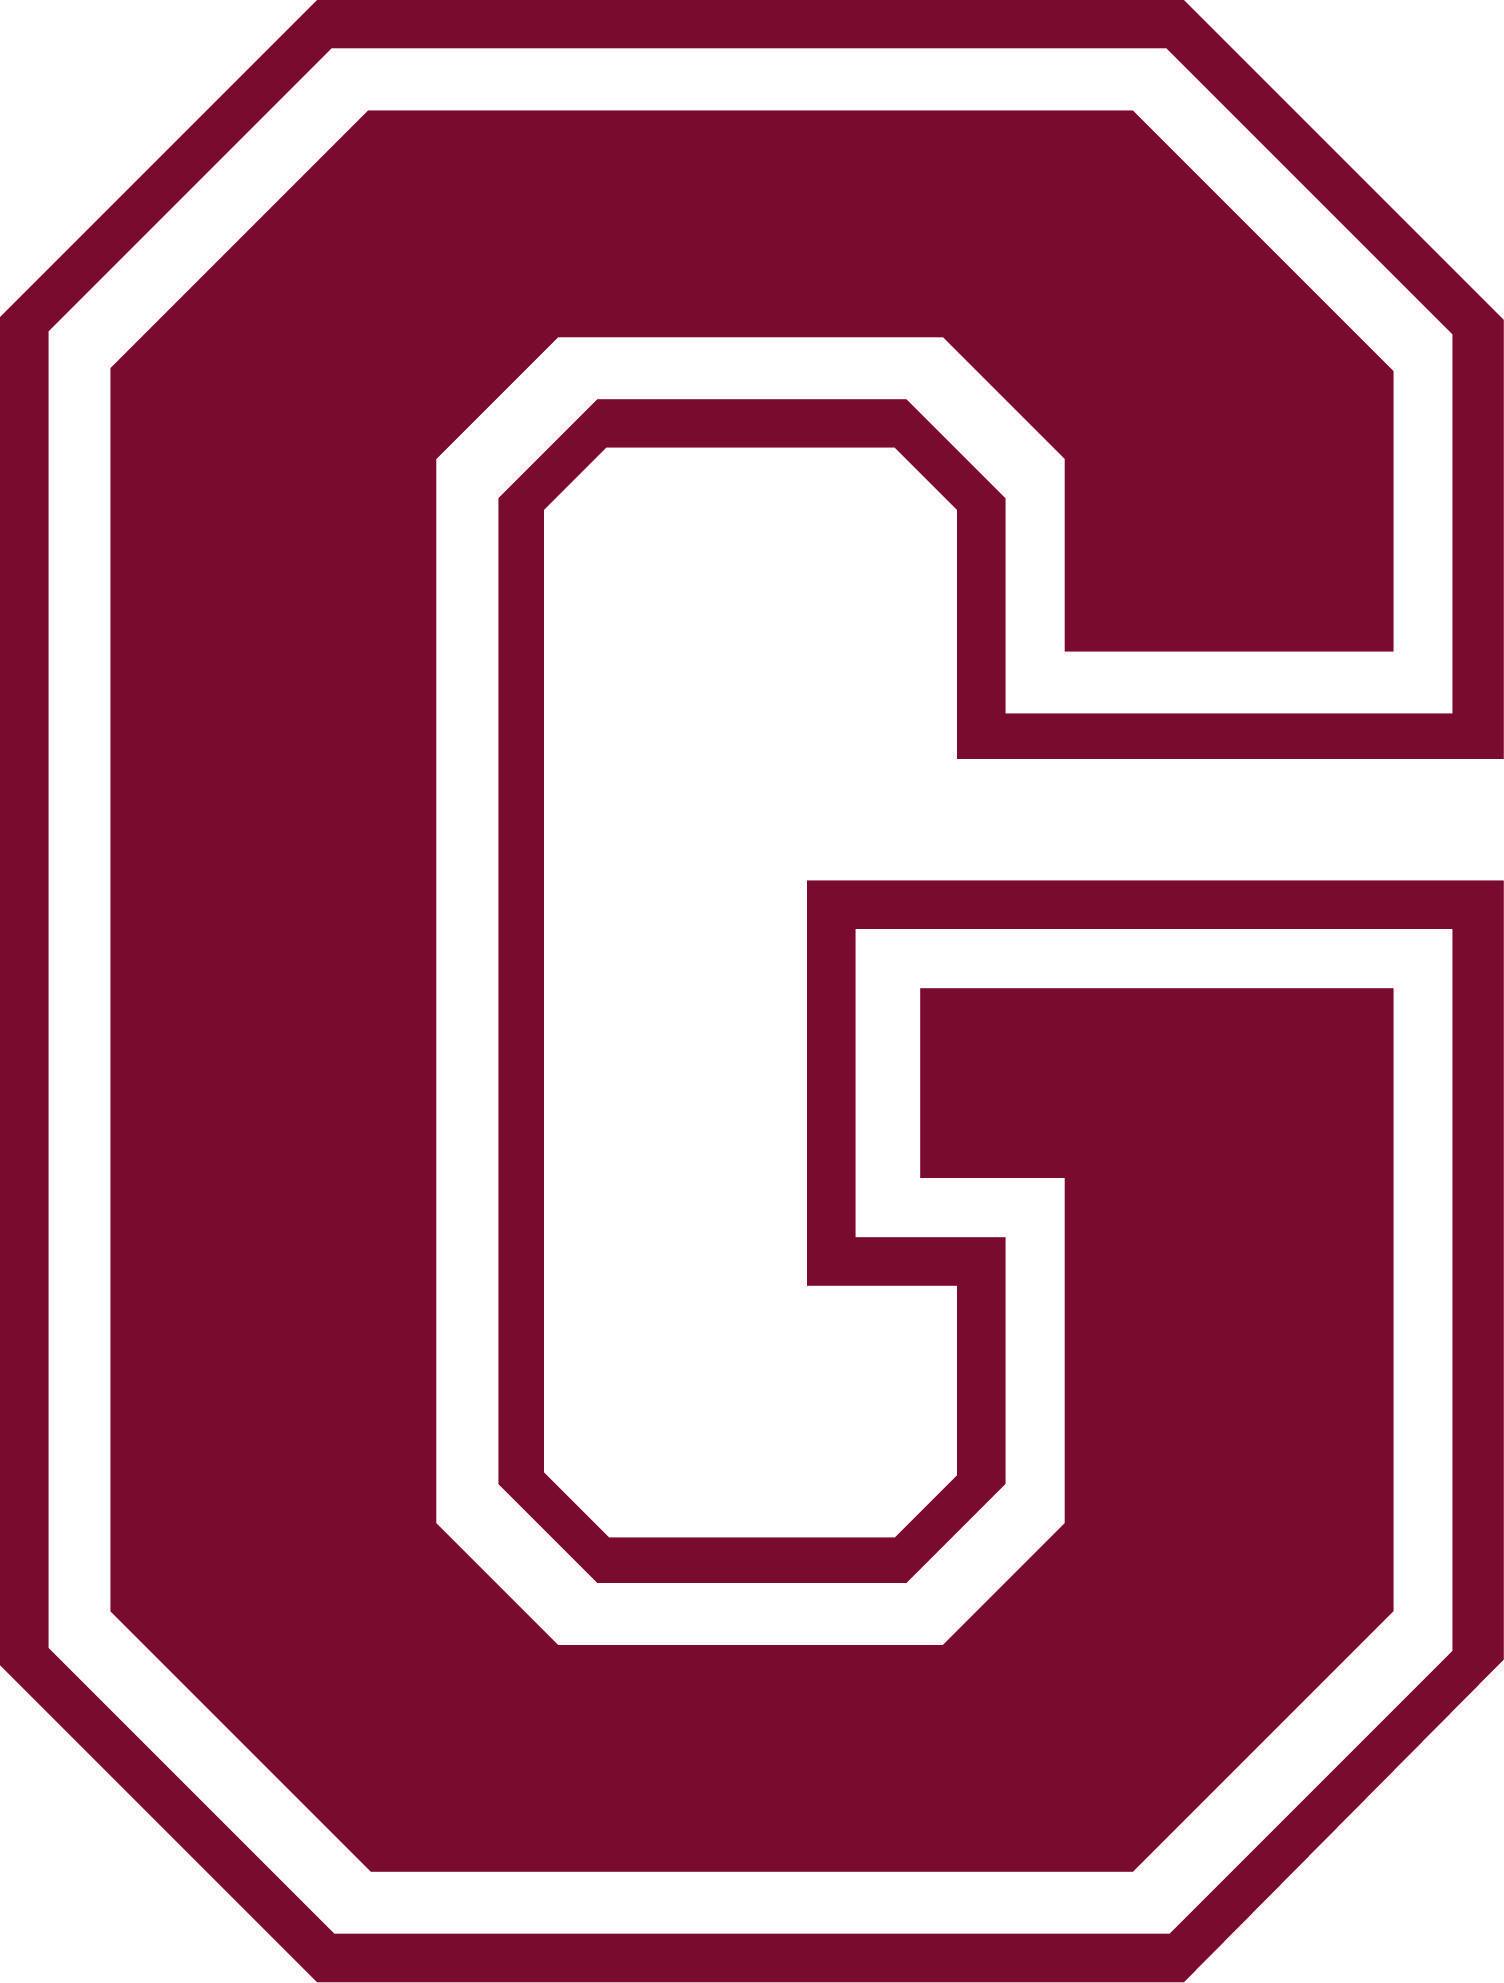 Grandville block G logo